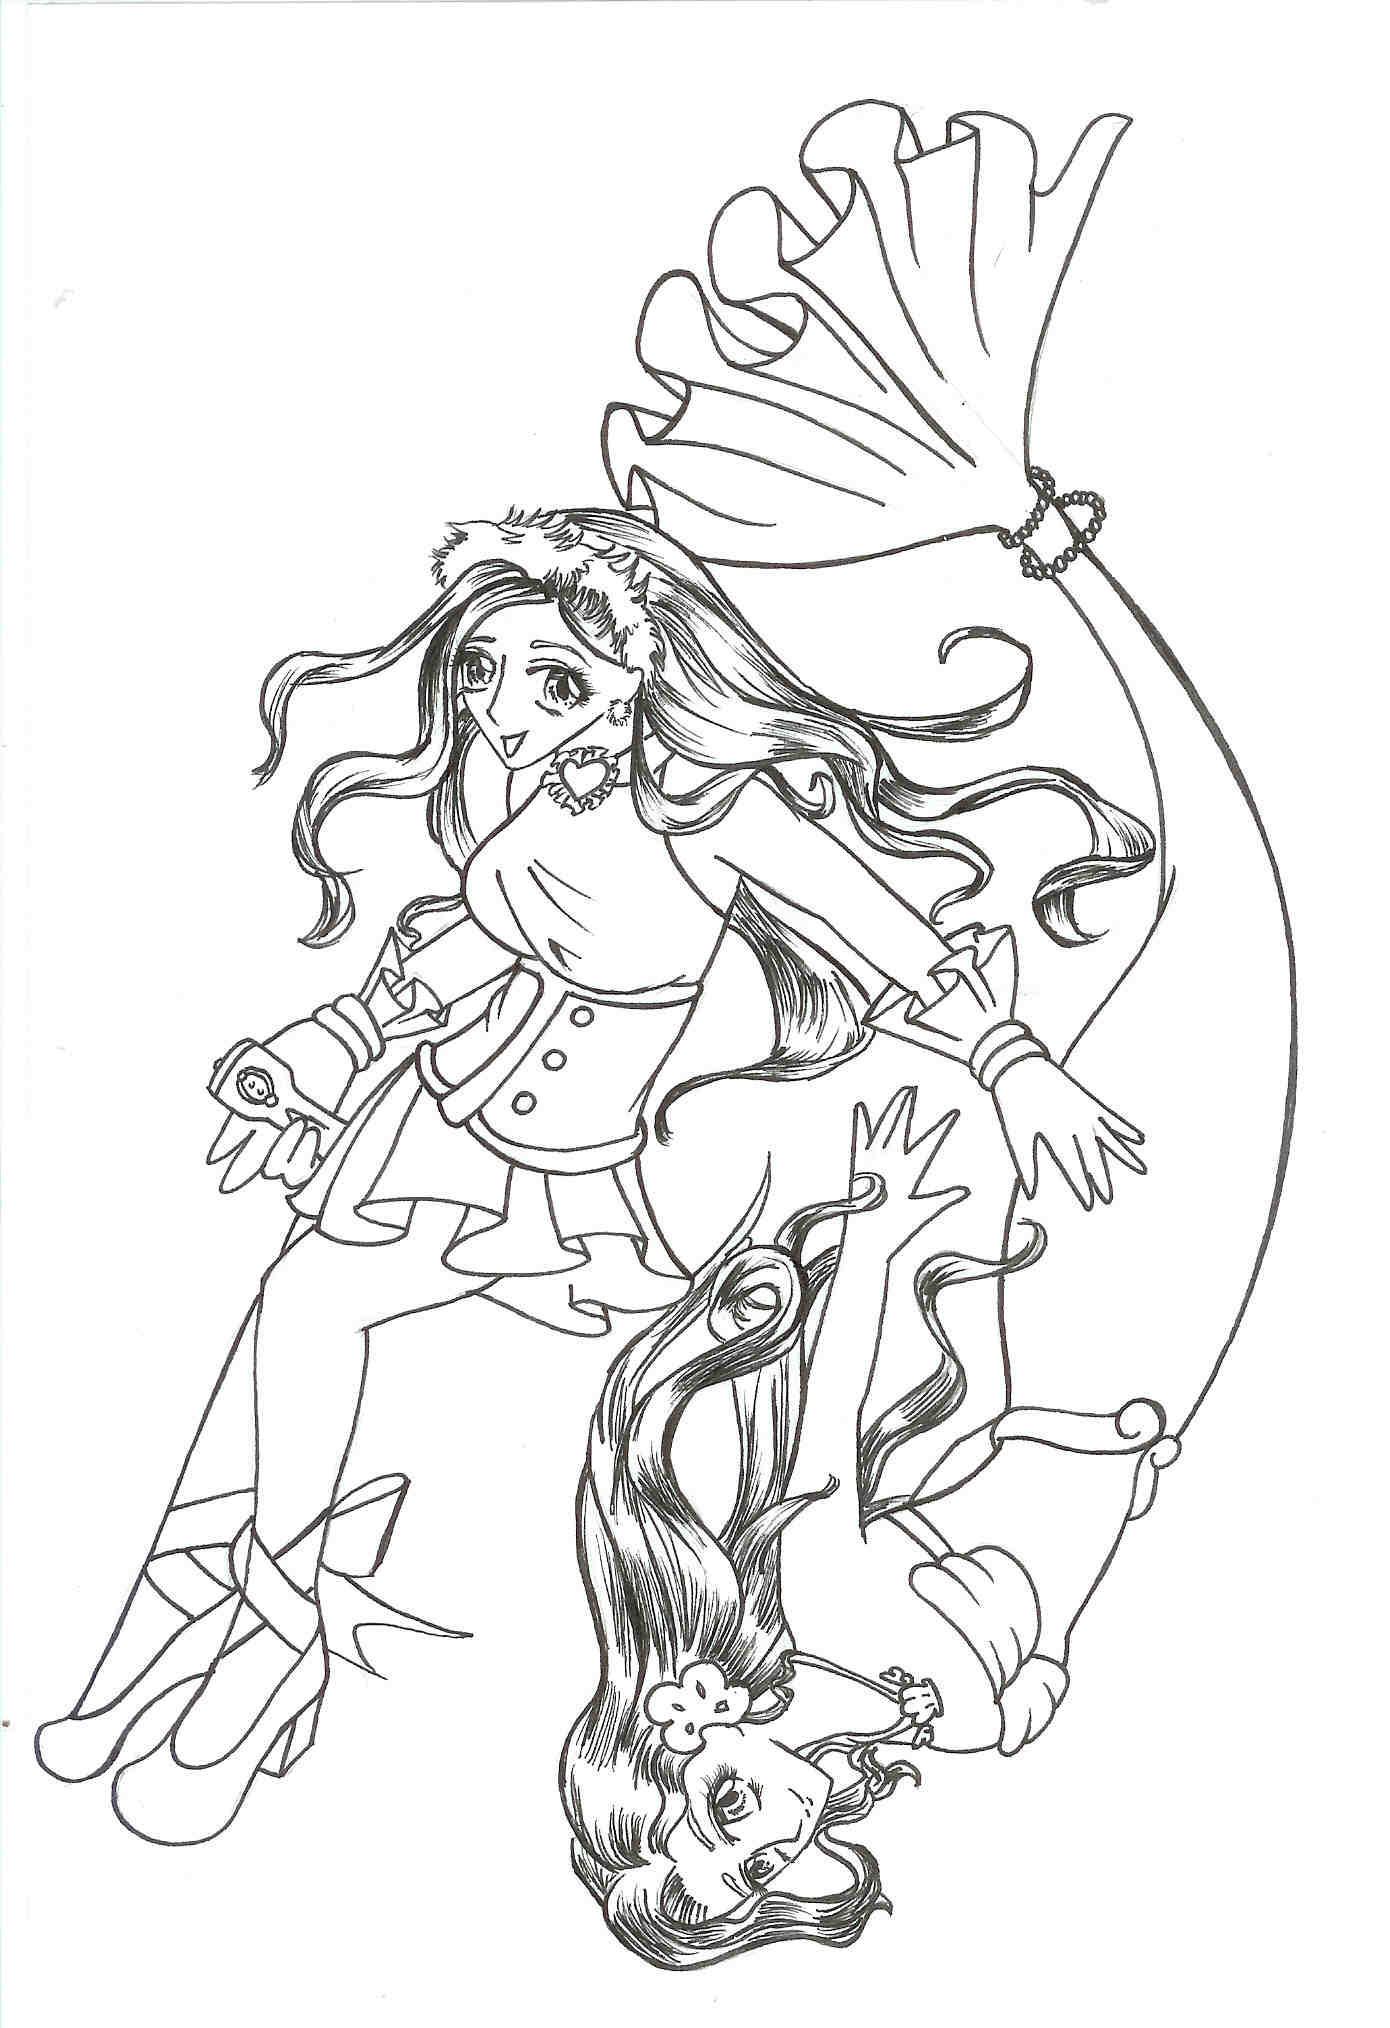 Manga Style Disney Princess by Chihiro Howe Ariel  Manga Mermaid Princess